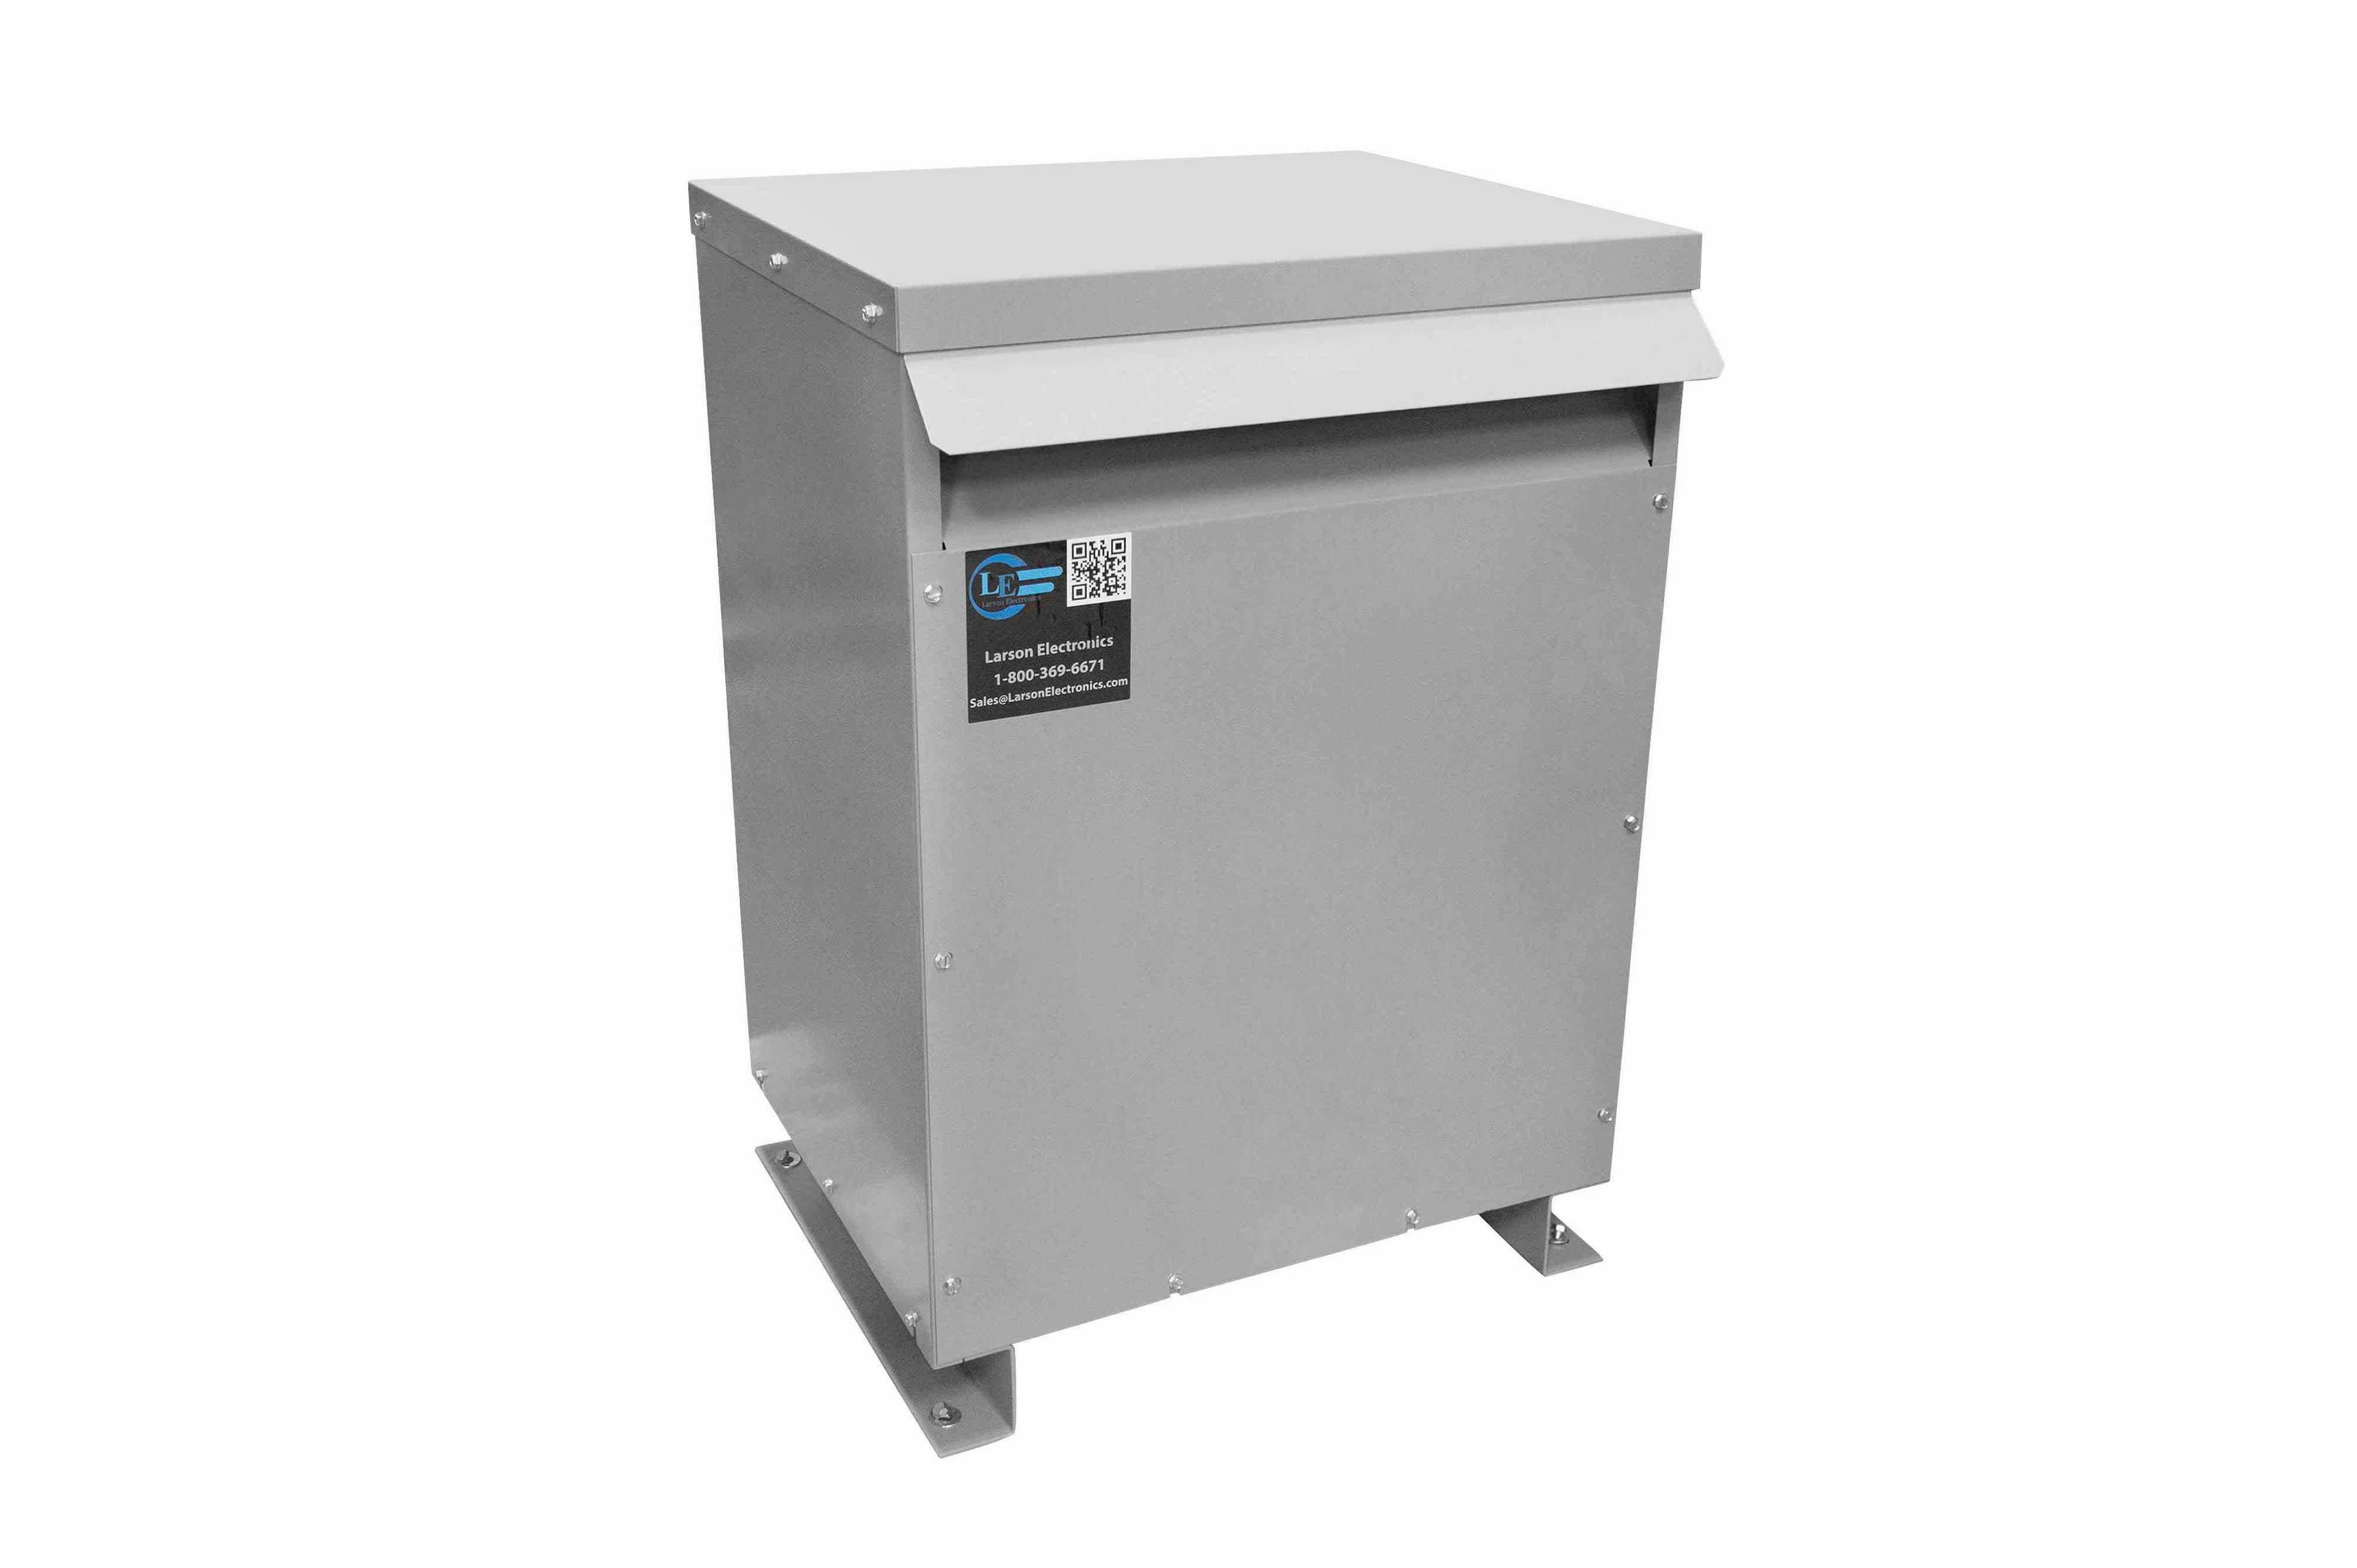 42.5 kVA 3PH Isolation Transformer, 480V Wye Primary, 415V Delta Secondary, N3R, Ventilated, 60 Hz